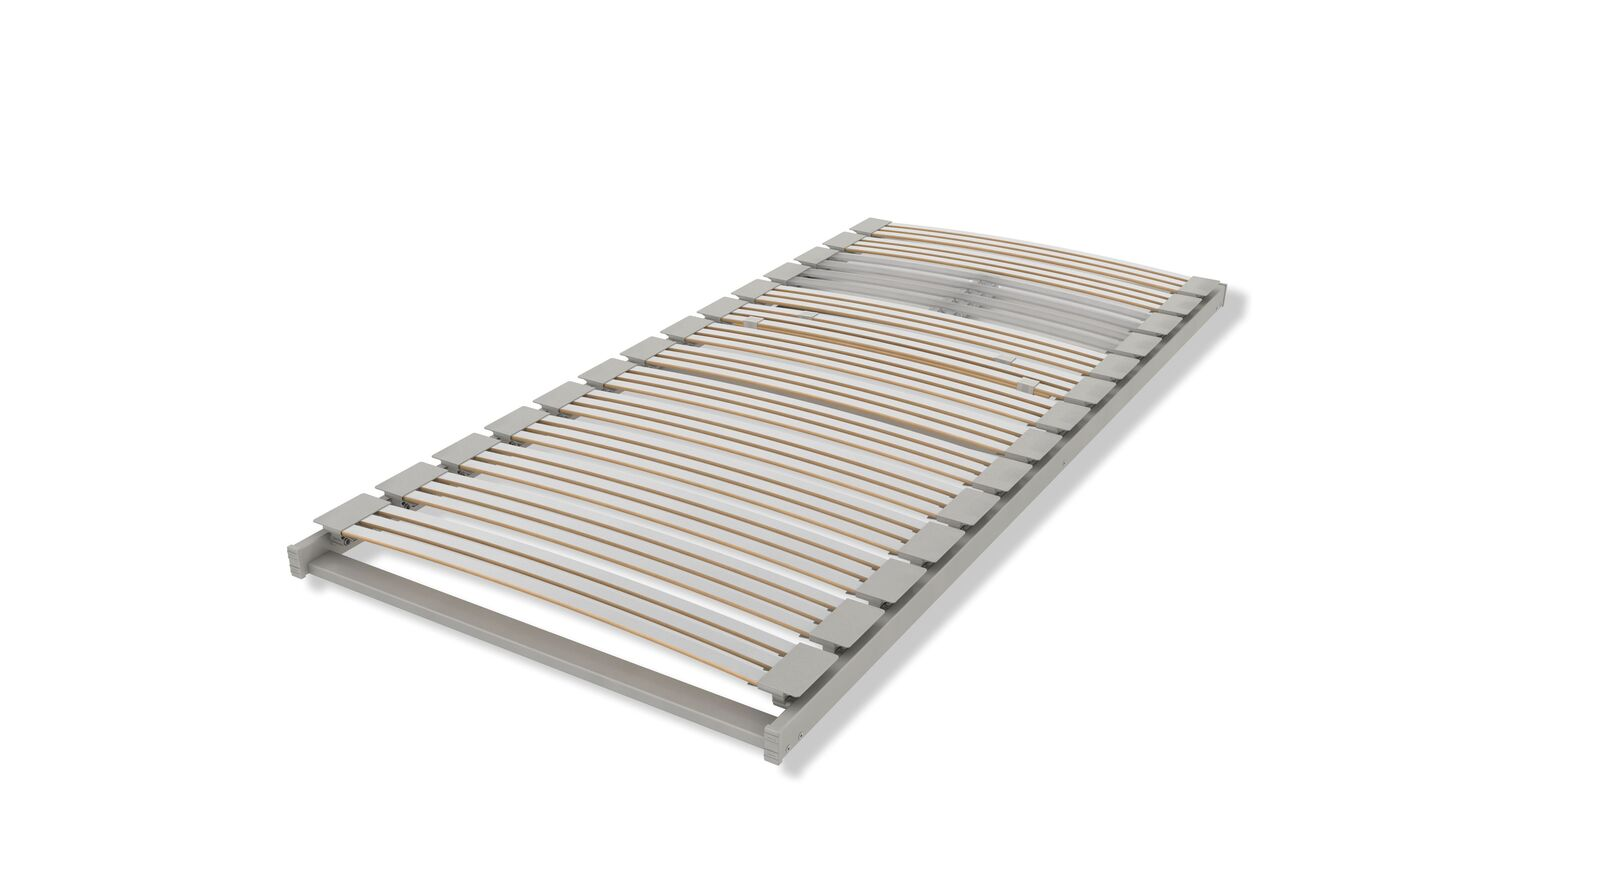 Lattenrost 120x200 5-Zonen